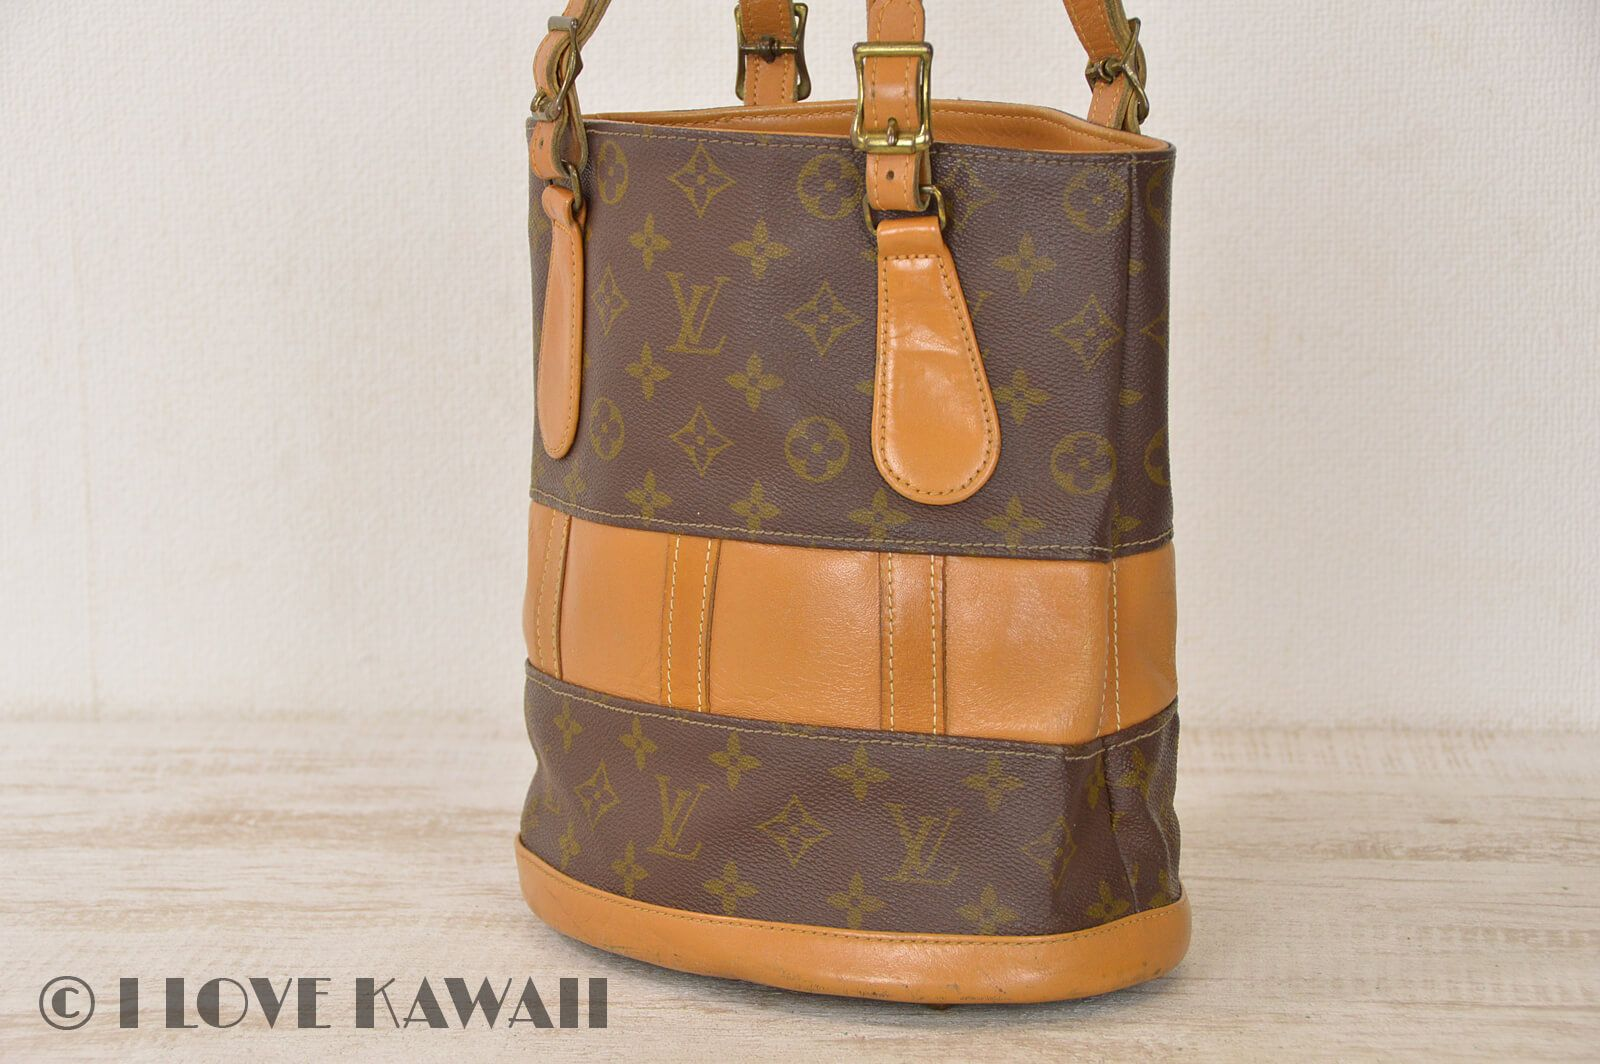 b0836e8e8c3e Vintage Louis Vuitton Monogram Bucket PM USA Tote Shoulder Bag T42238